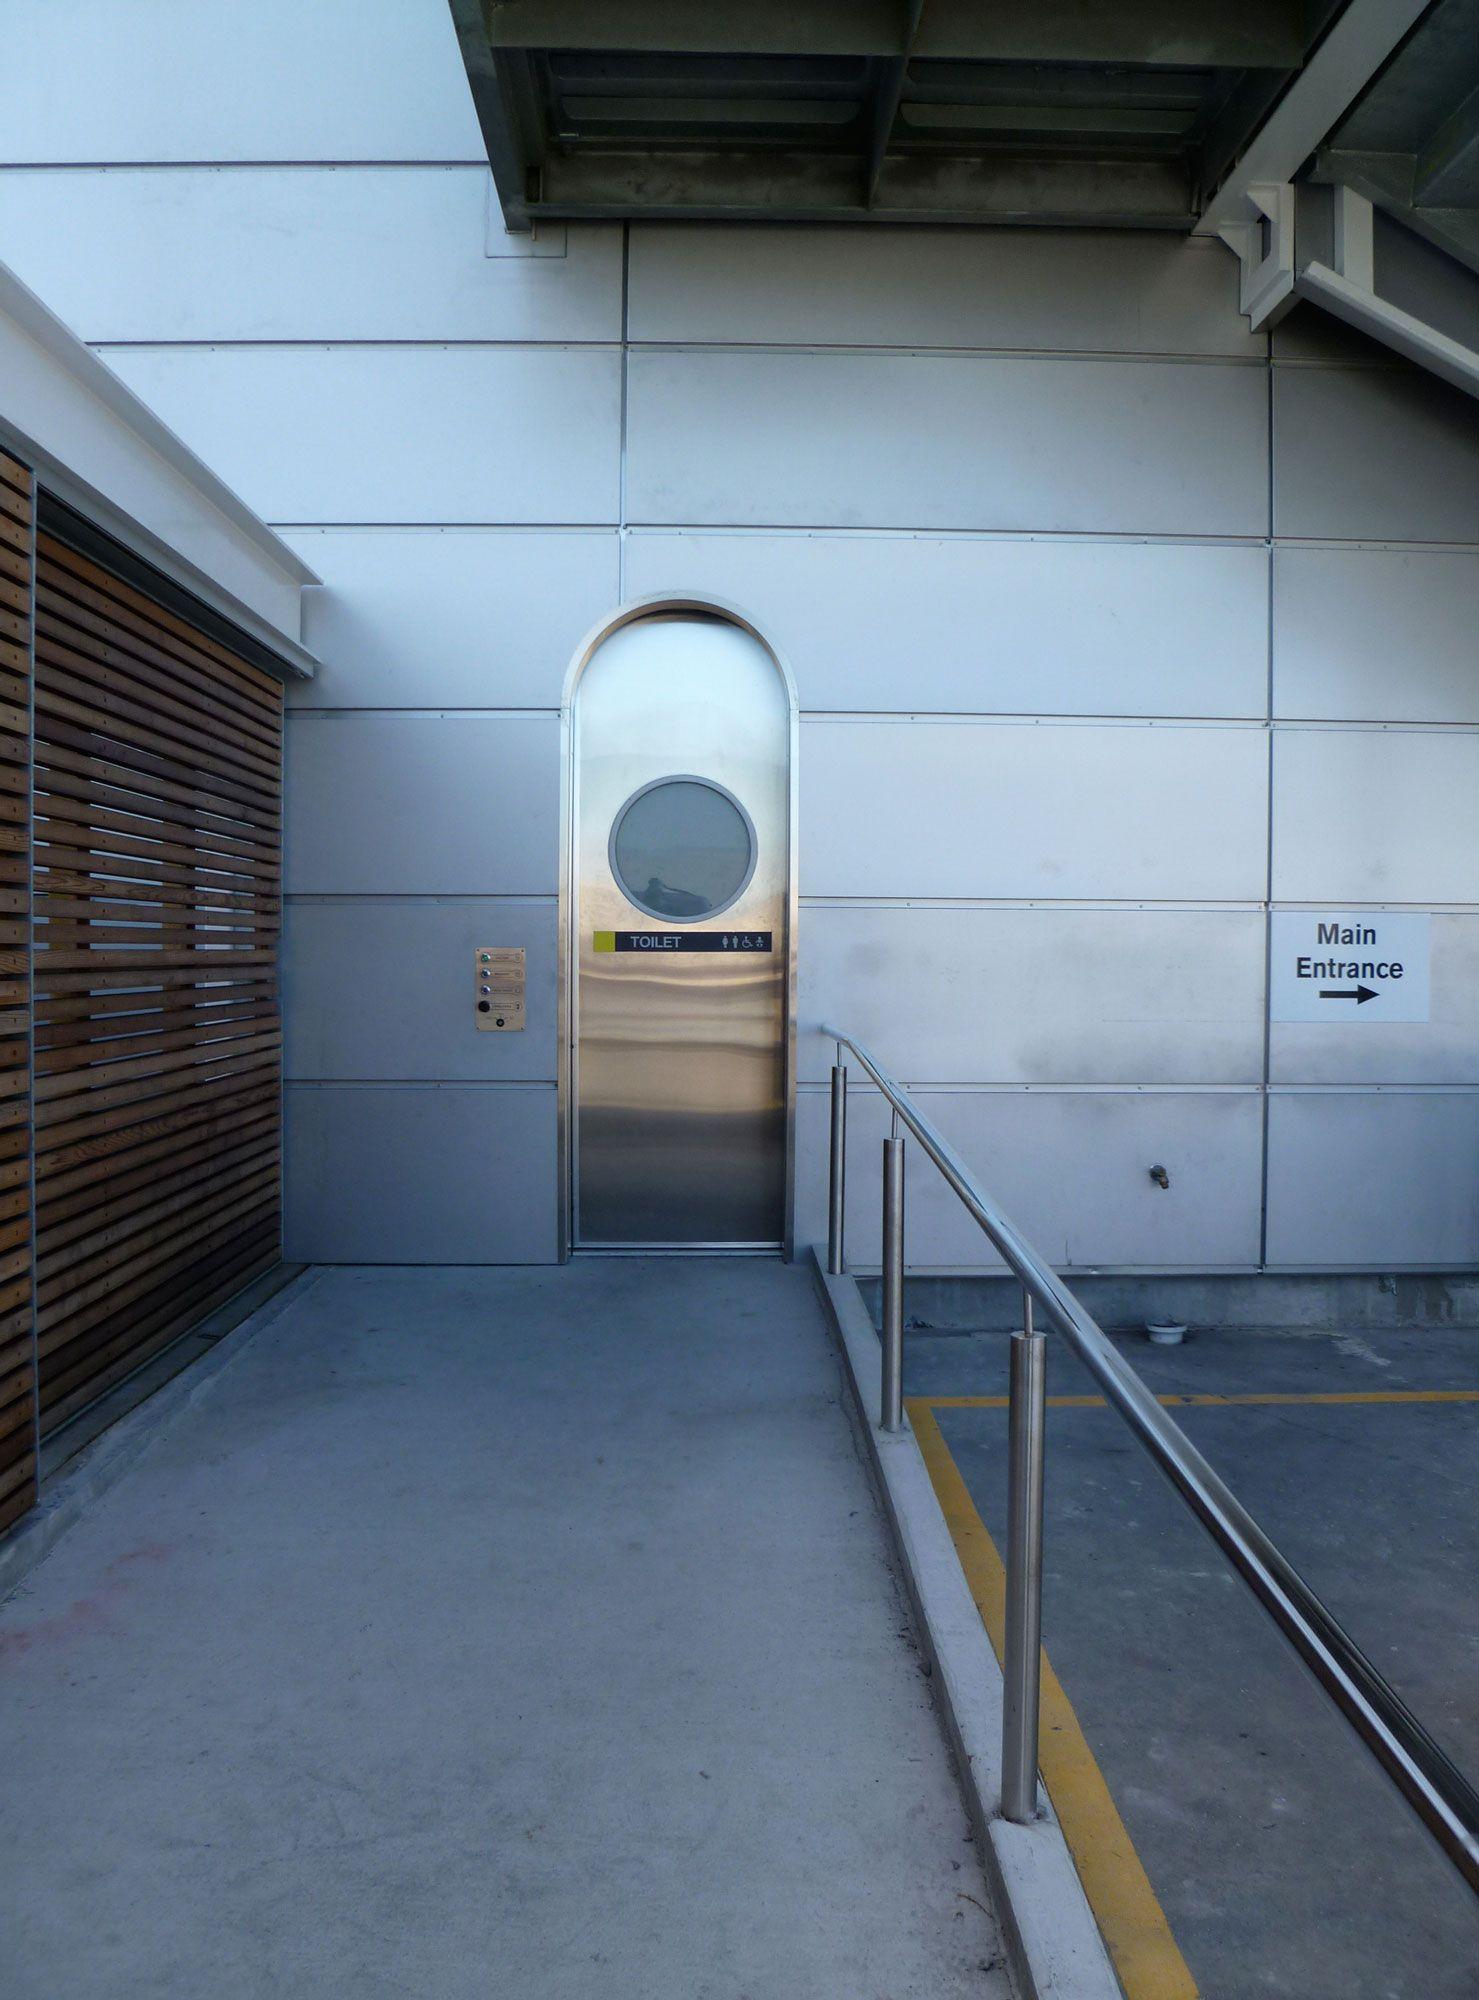 Autocav Wc Sliding Door Hardware Sliders Universal Design